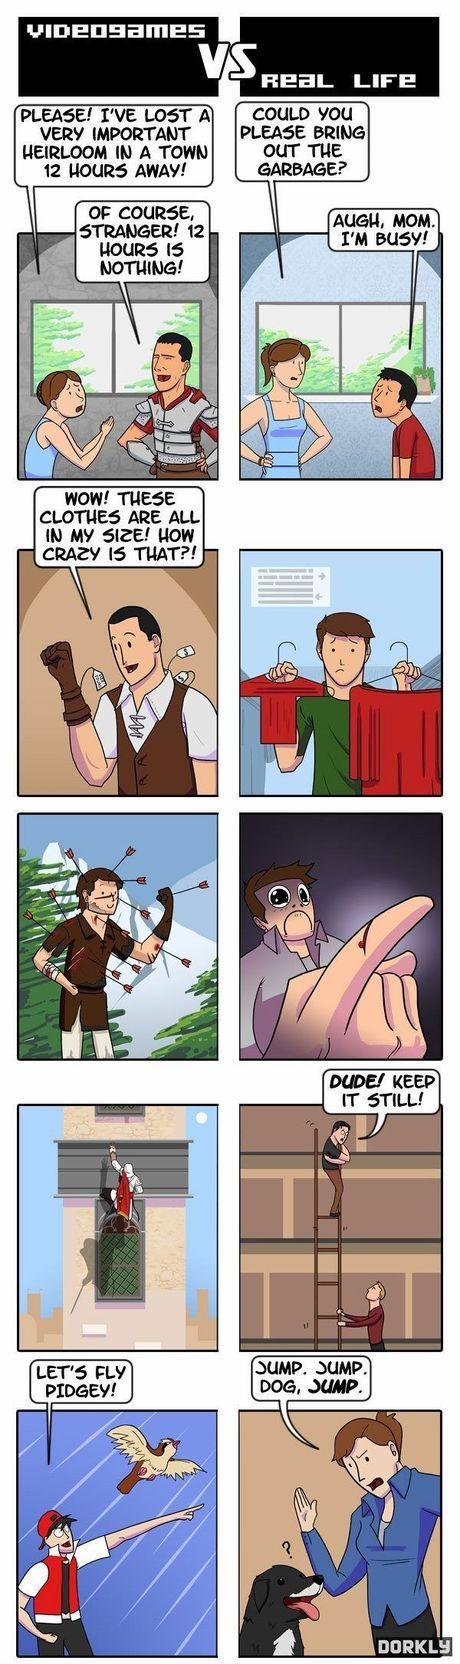 Videogames vs. Real Life. Yup- video game logic :D